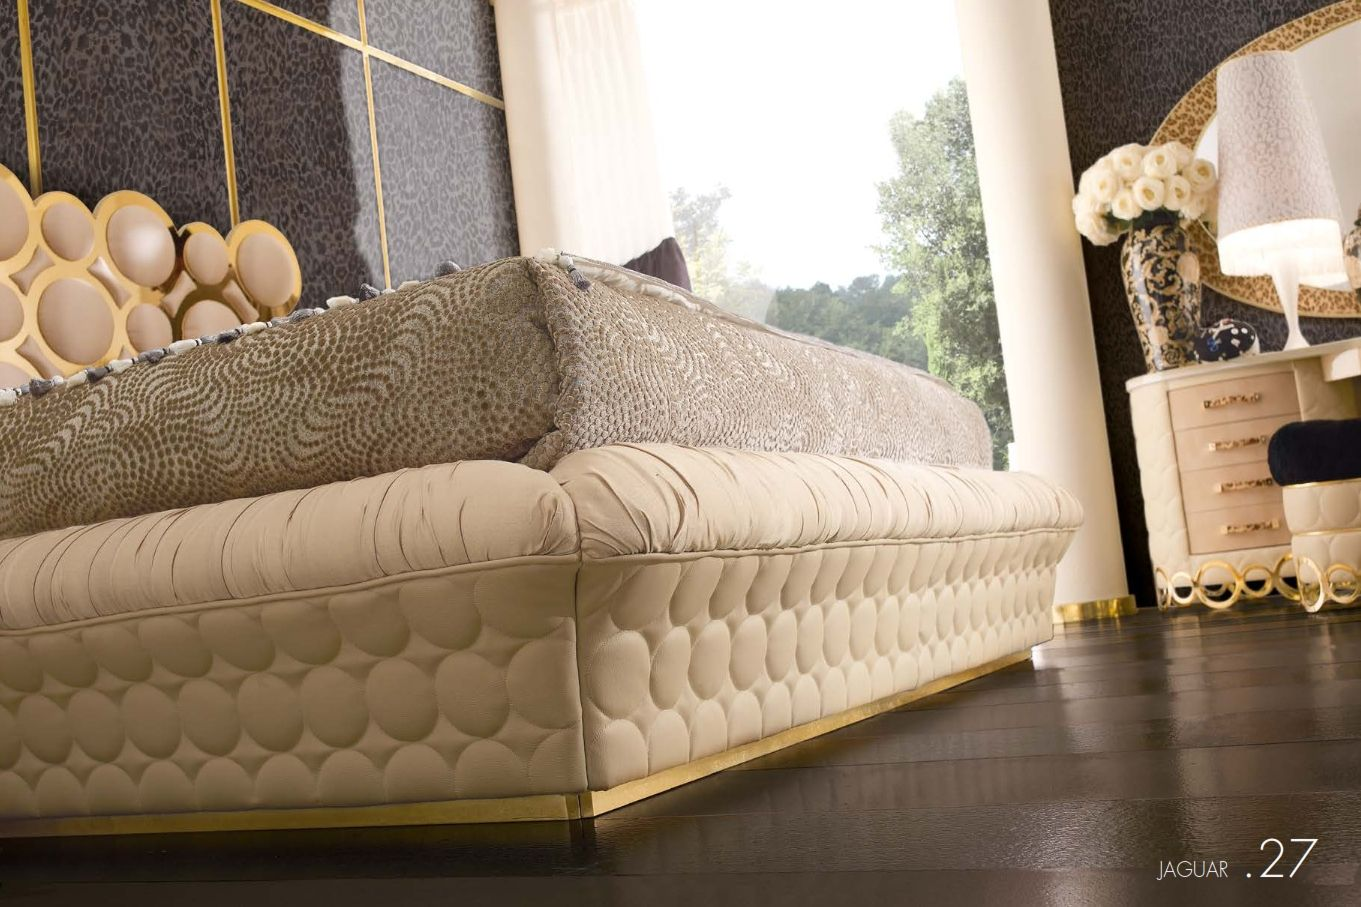 luxus m bel luxus schlafzimmer alta moda jaguar seriedie m bel aus italien. Black Bedroom Furniture Sets. Home Design Ideas